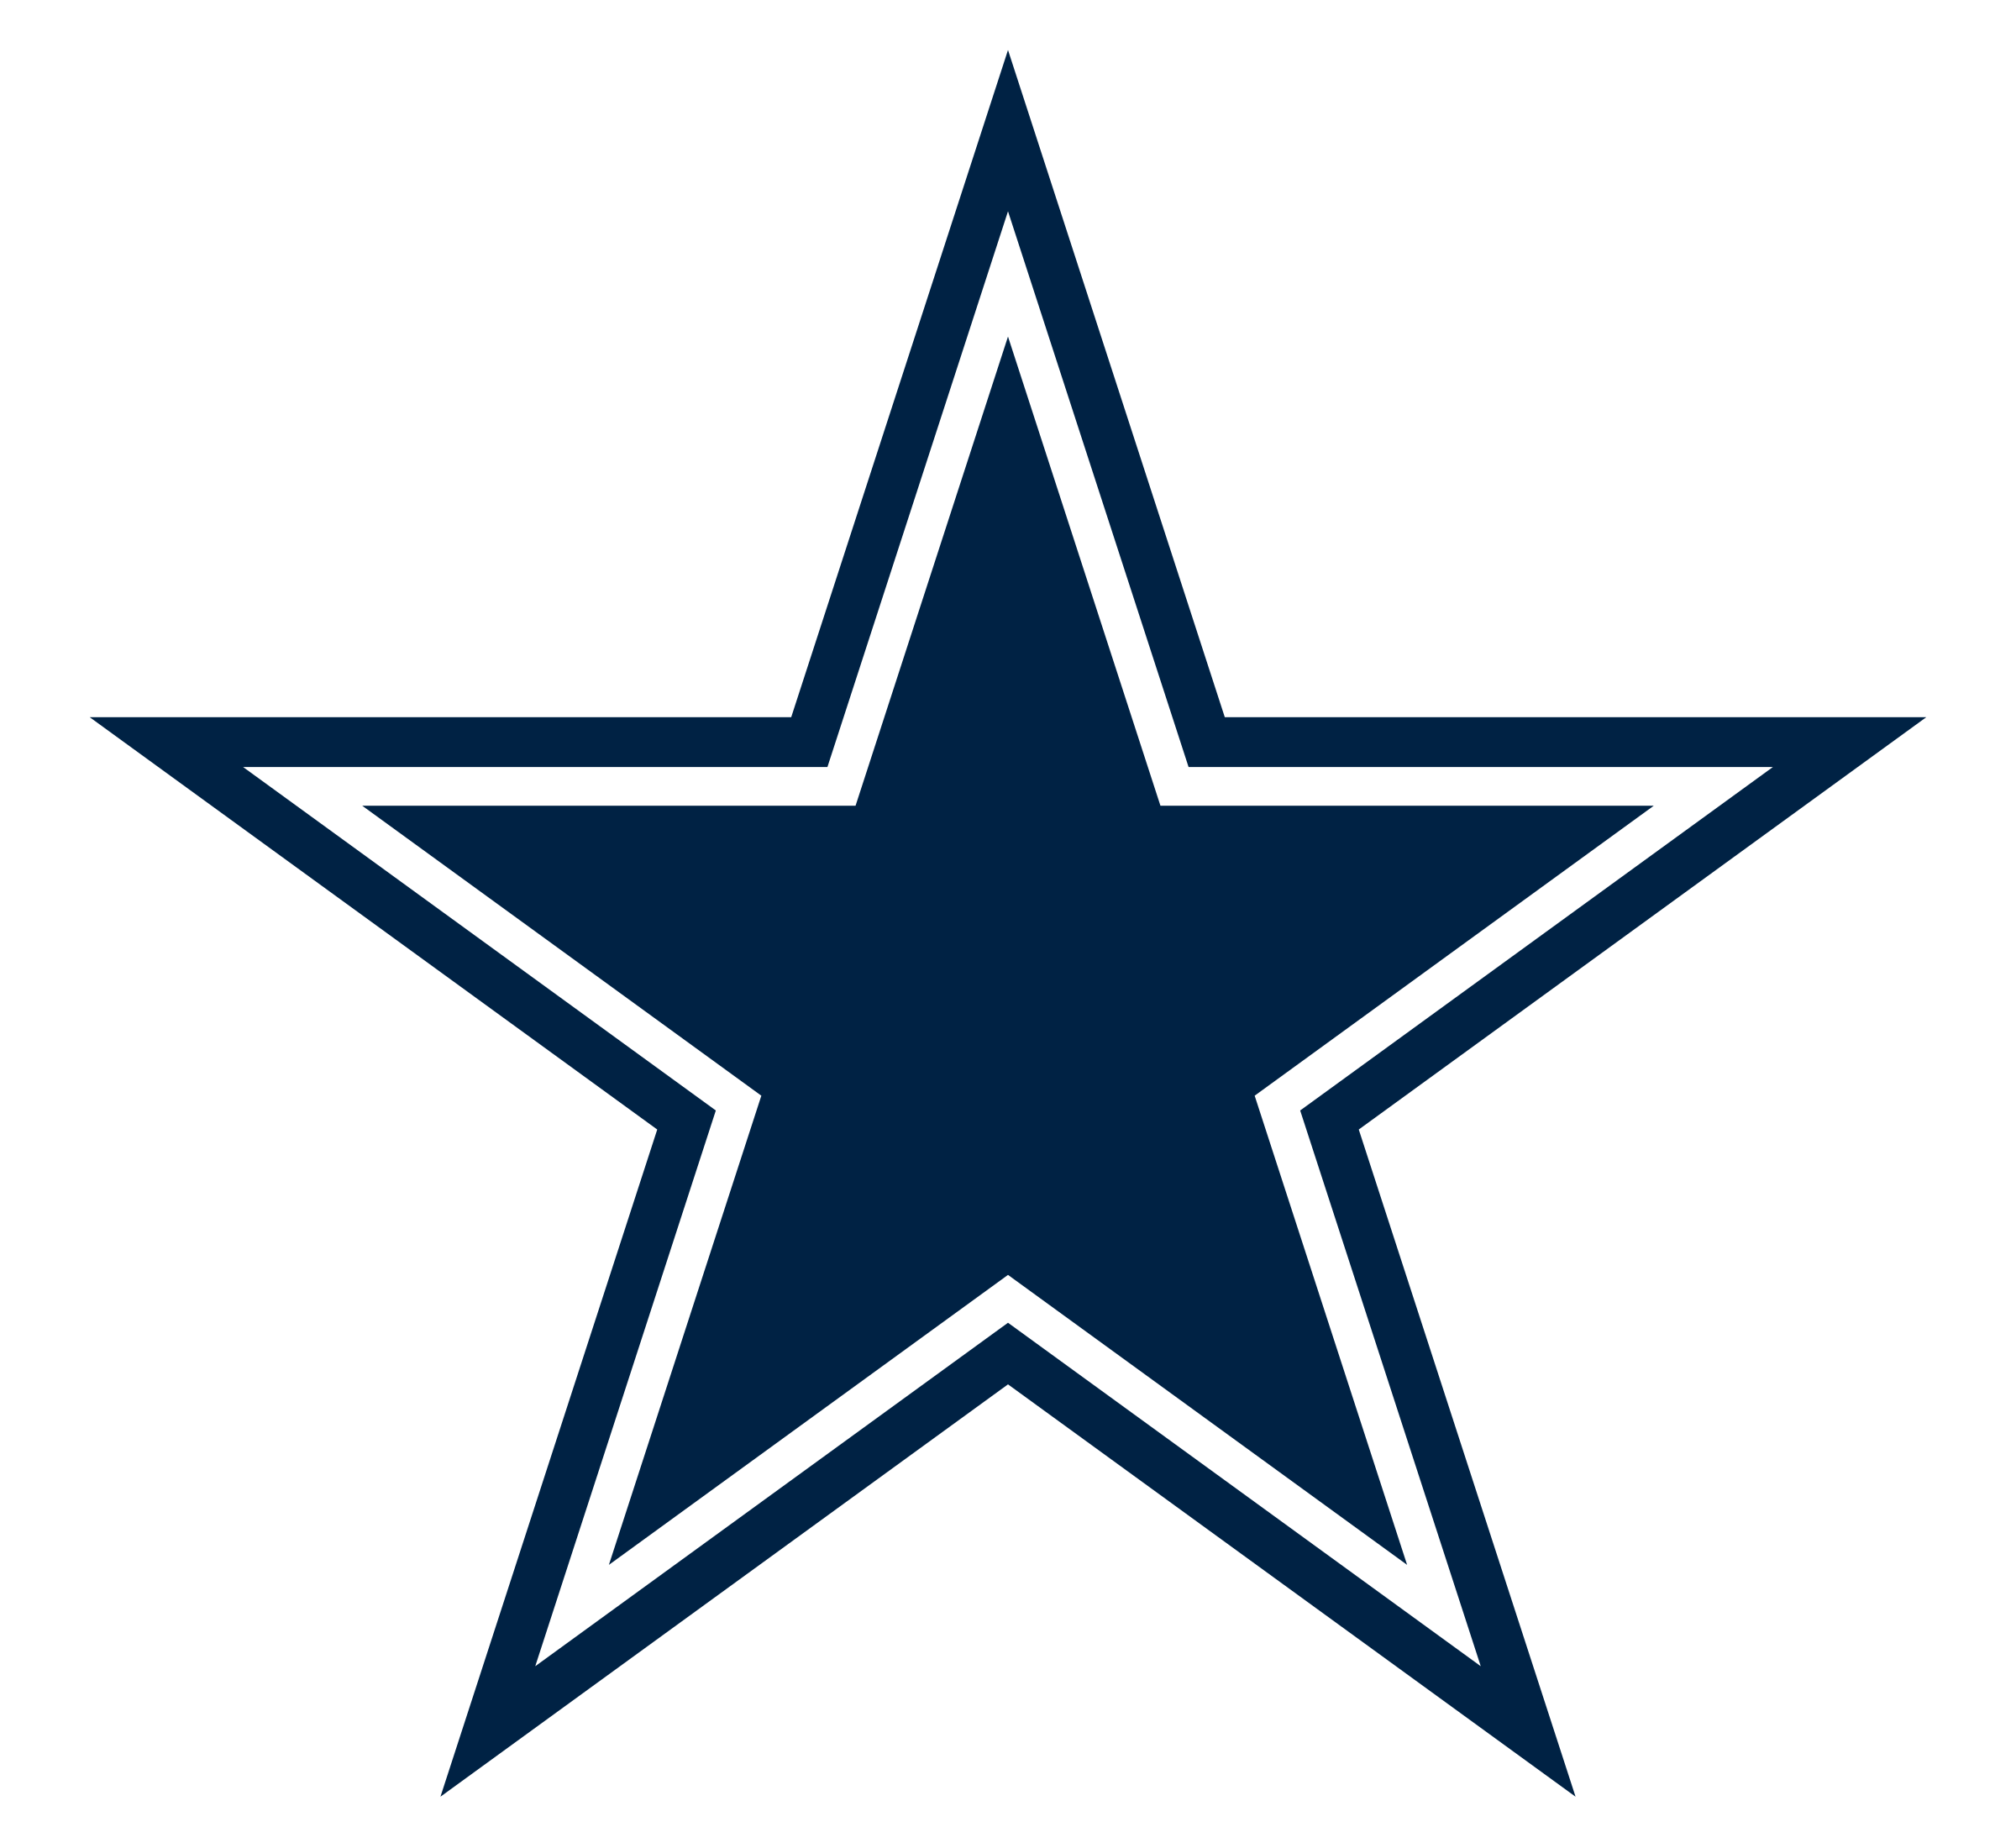 dallas cowboys logo png transparent svg vector freebie supply rh freebiesupply com  dallas cowboys helmet logo images